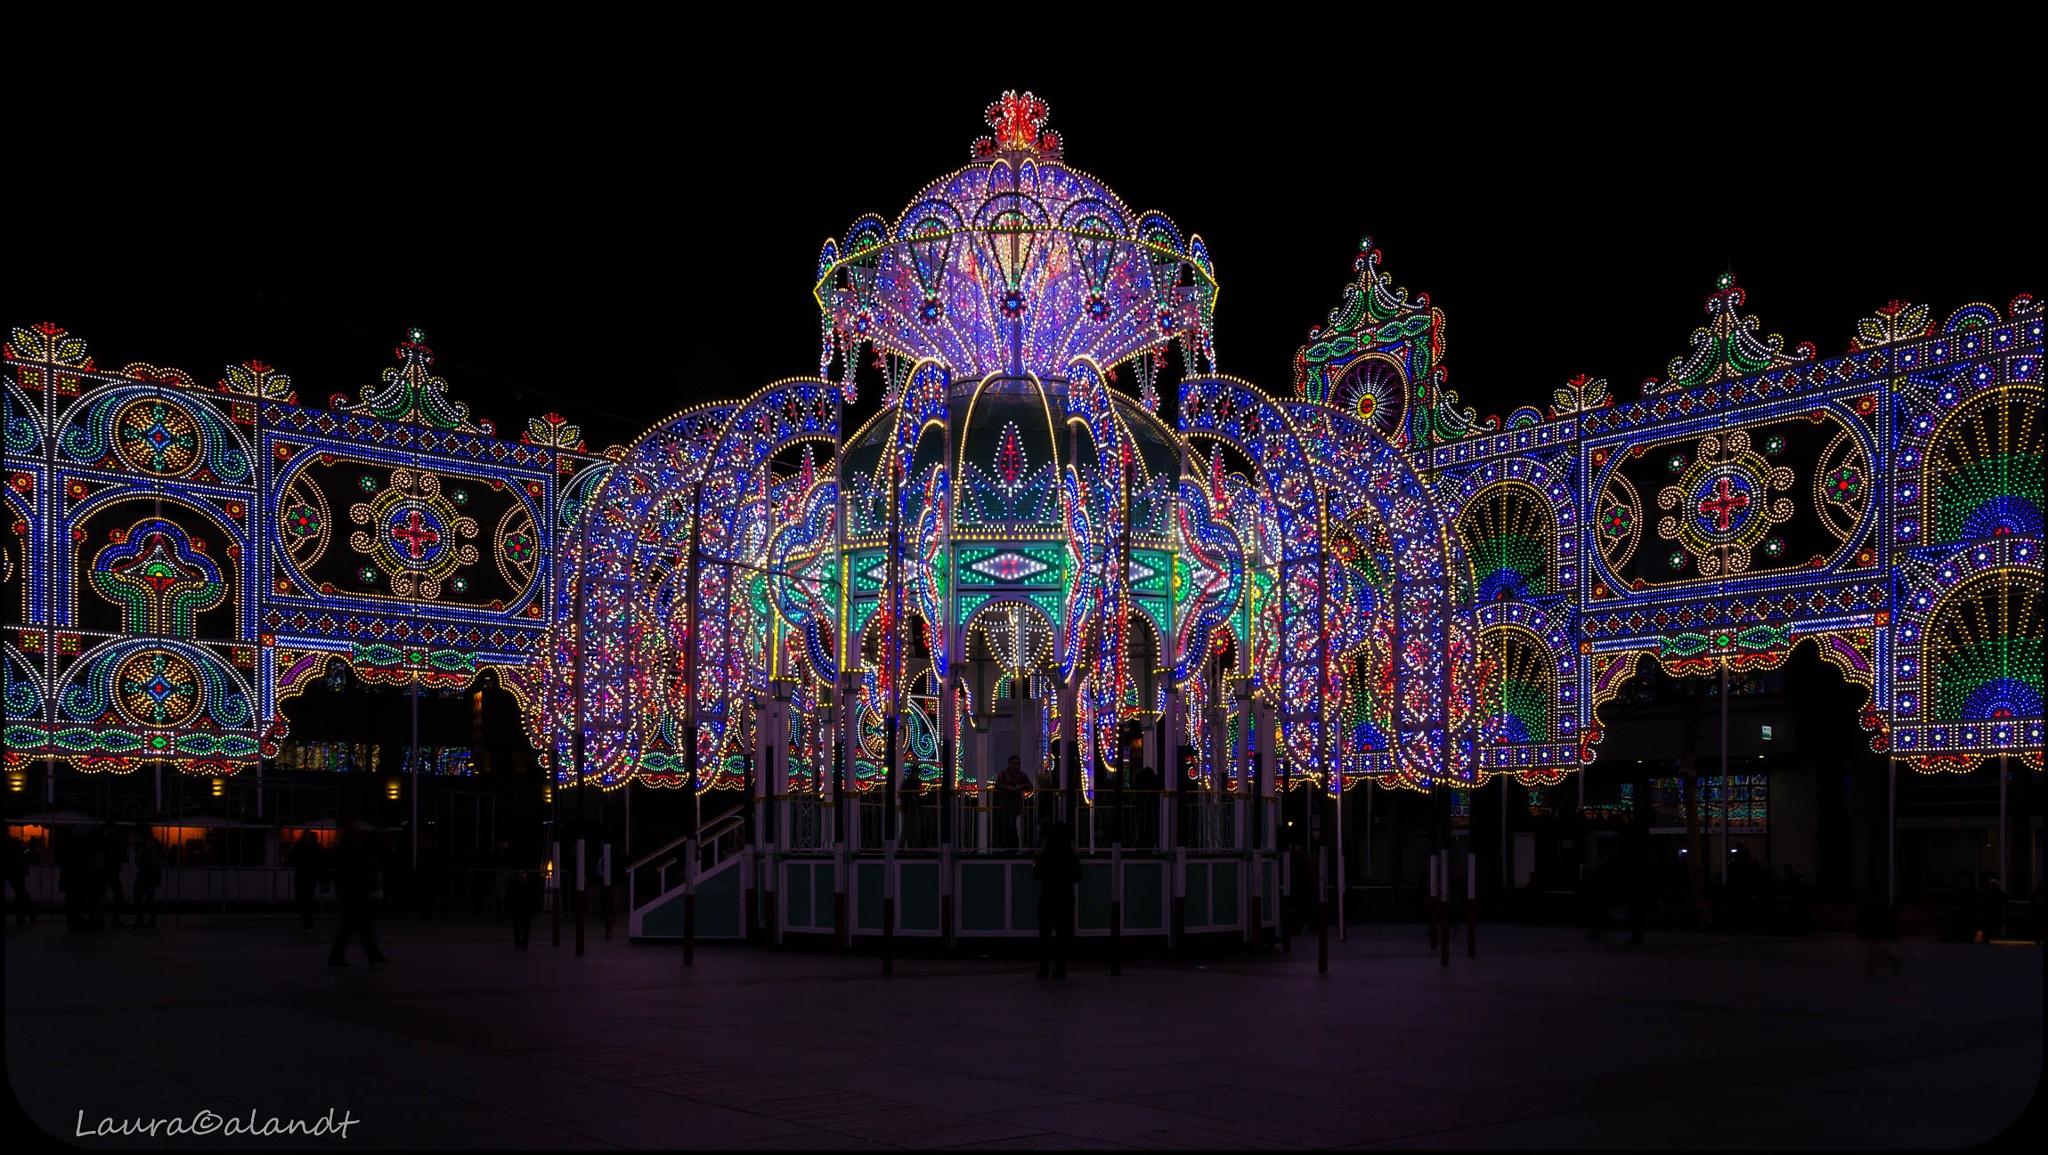 Glowcenter by Laura Calandt